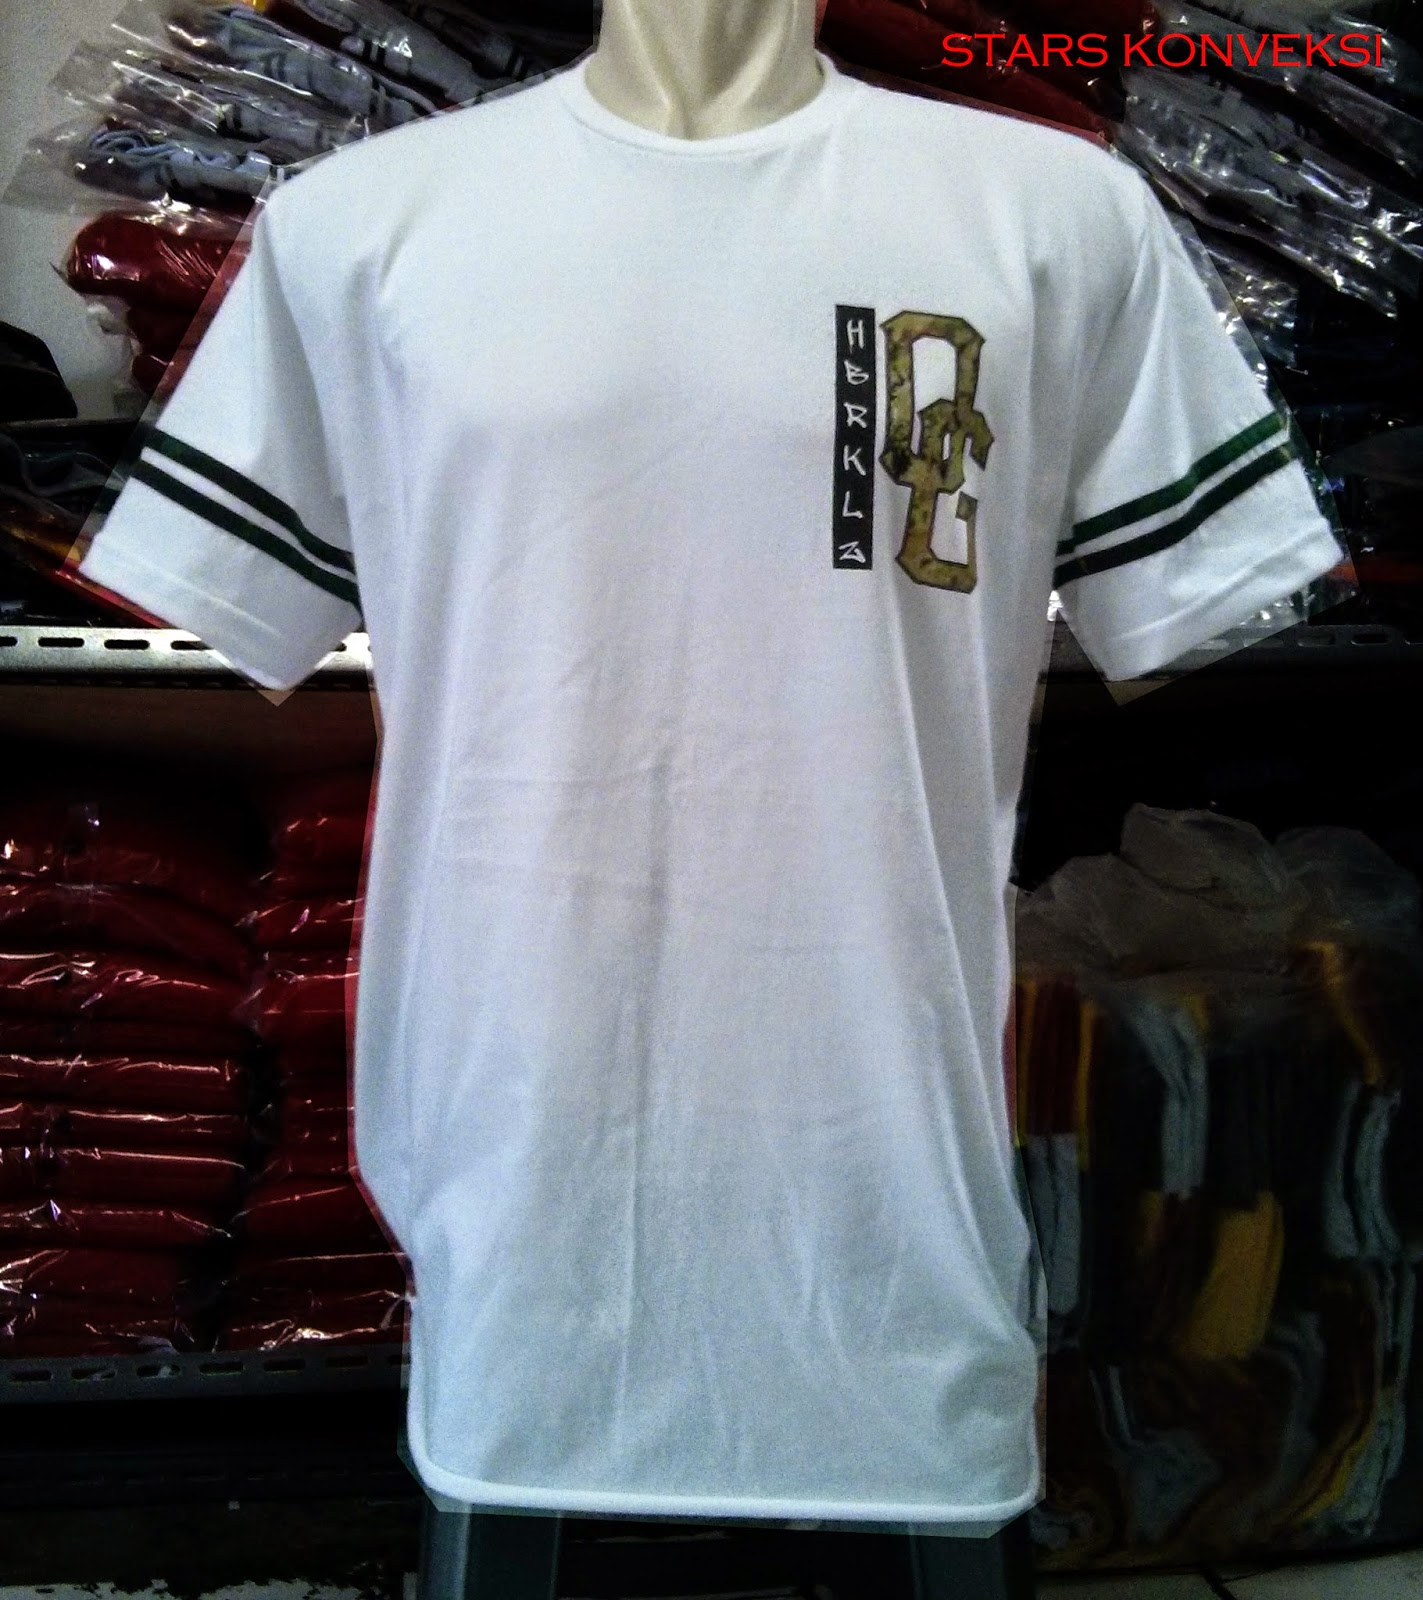 https://i1.wp.com/1.bp.blogspot.com/-zS4zfKVmFag/U57I_h-SUkI/AAAAAAAAAb4/IaoLPlR0Oh8/s1600/t-shirt+distro+vendor+malaysia.jpg?resize=479%2C538&ssl=1